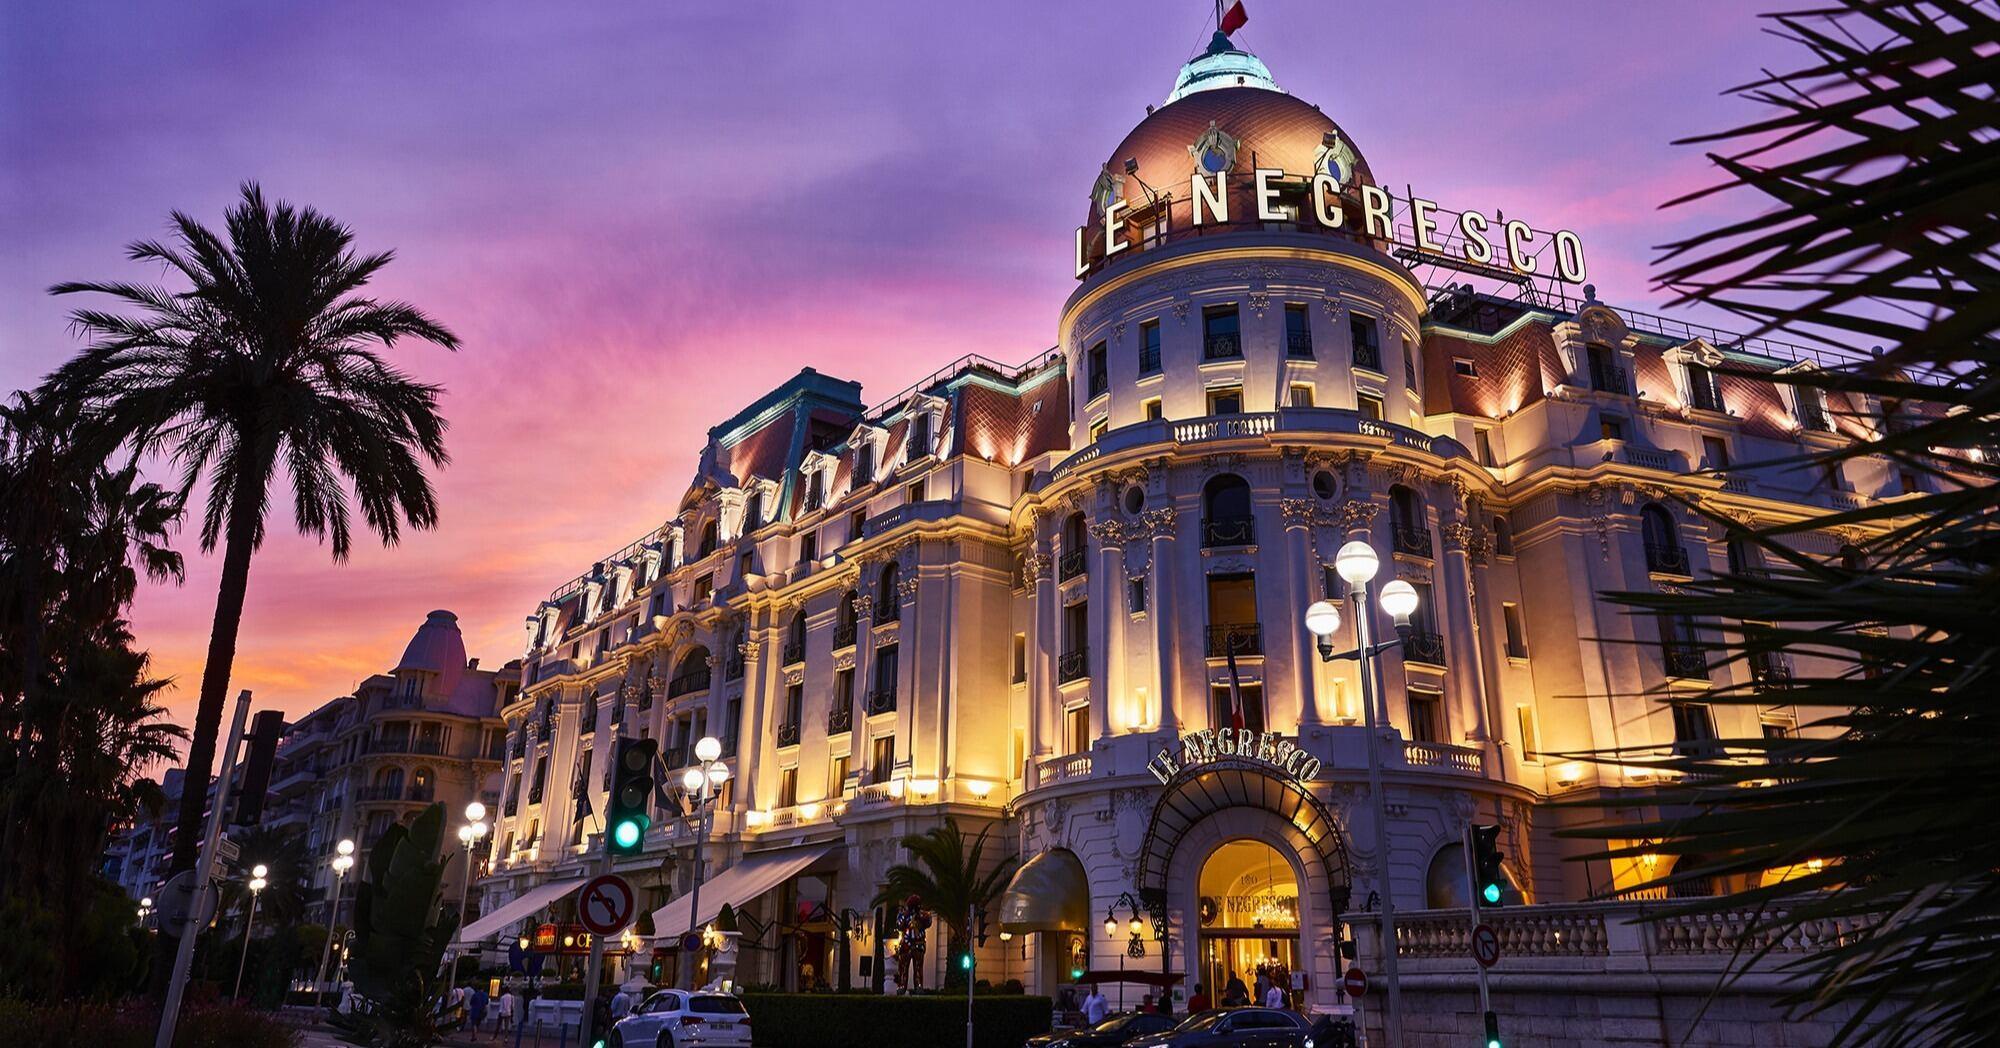 Hotel Negresco - Nice, France